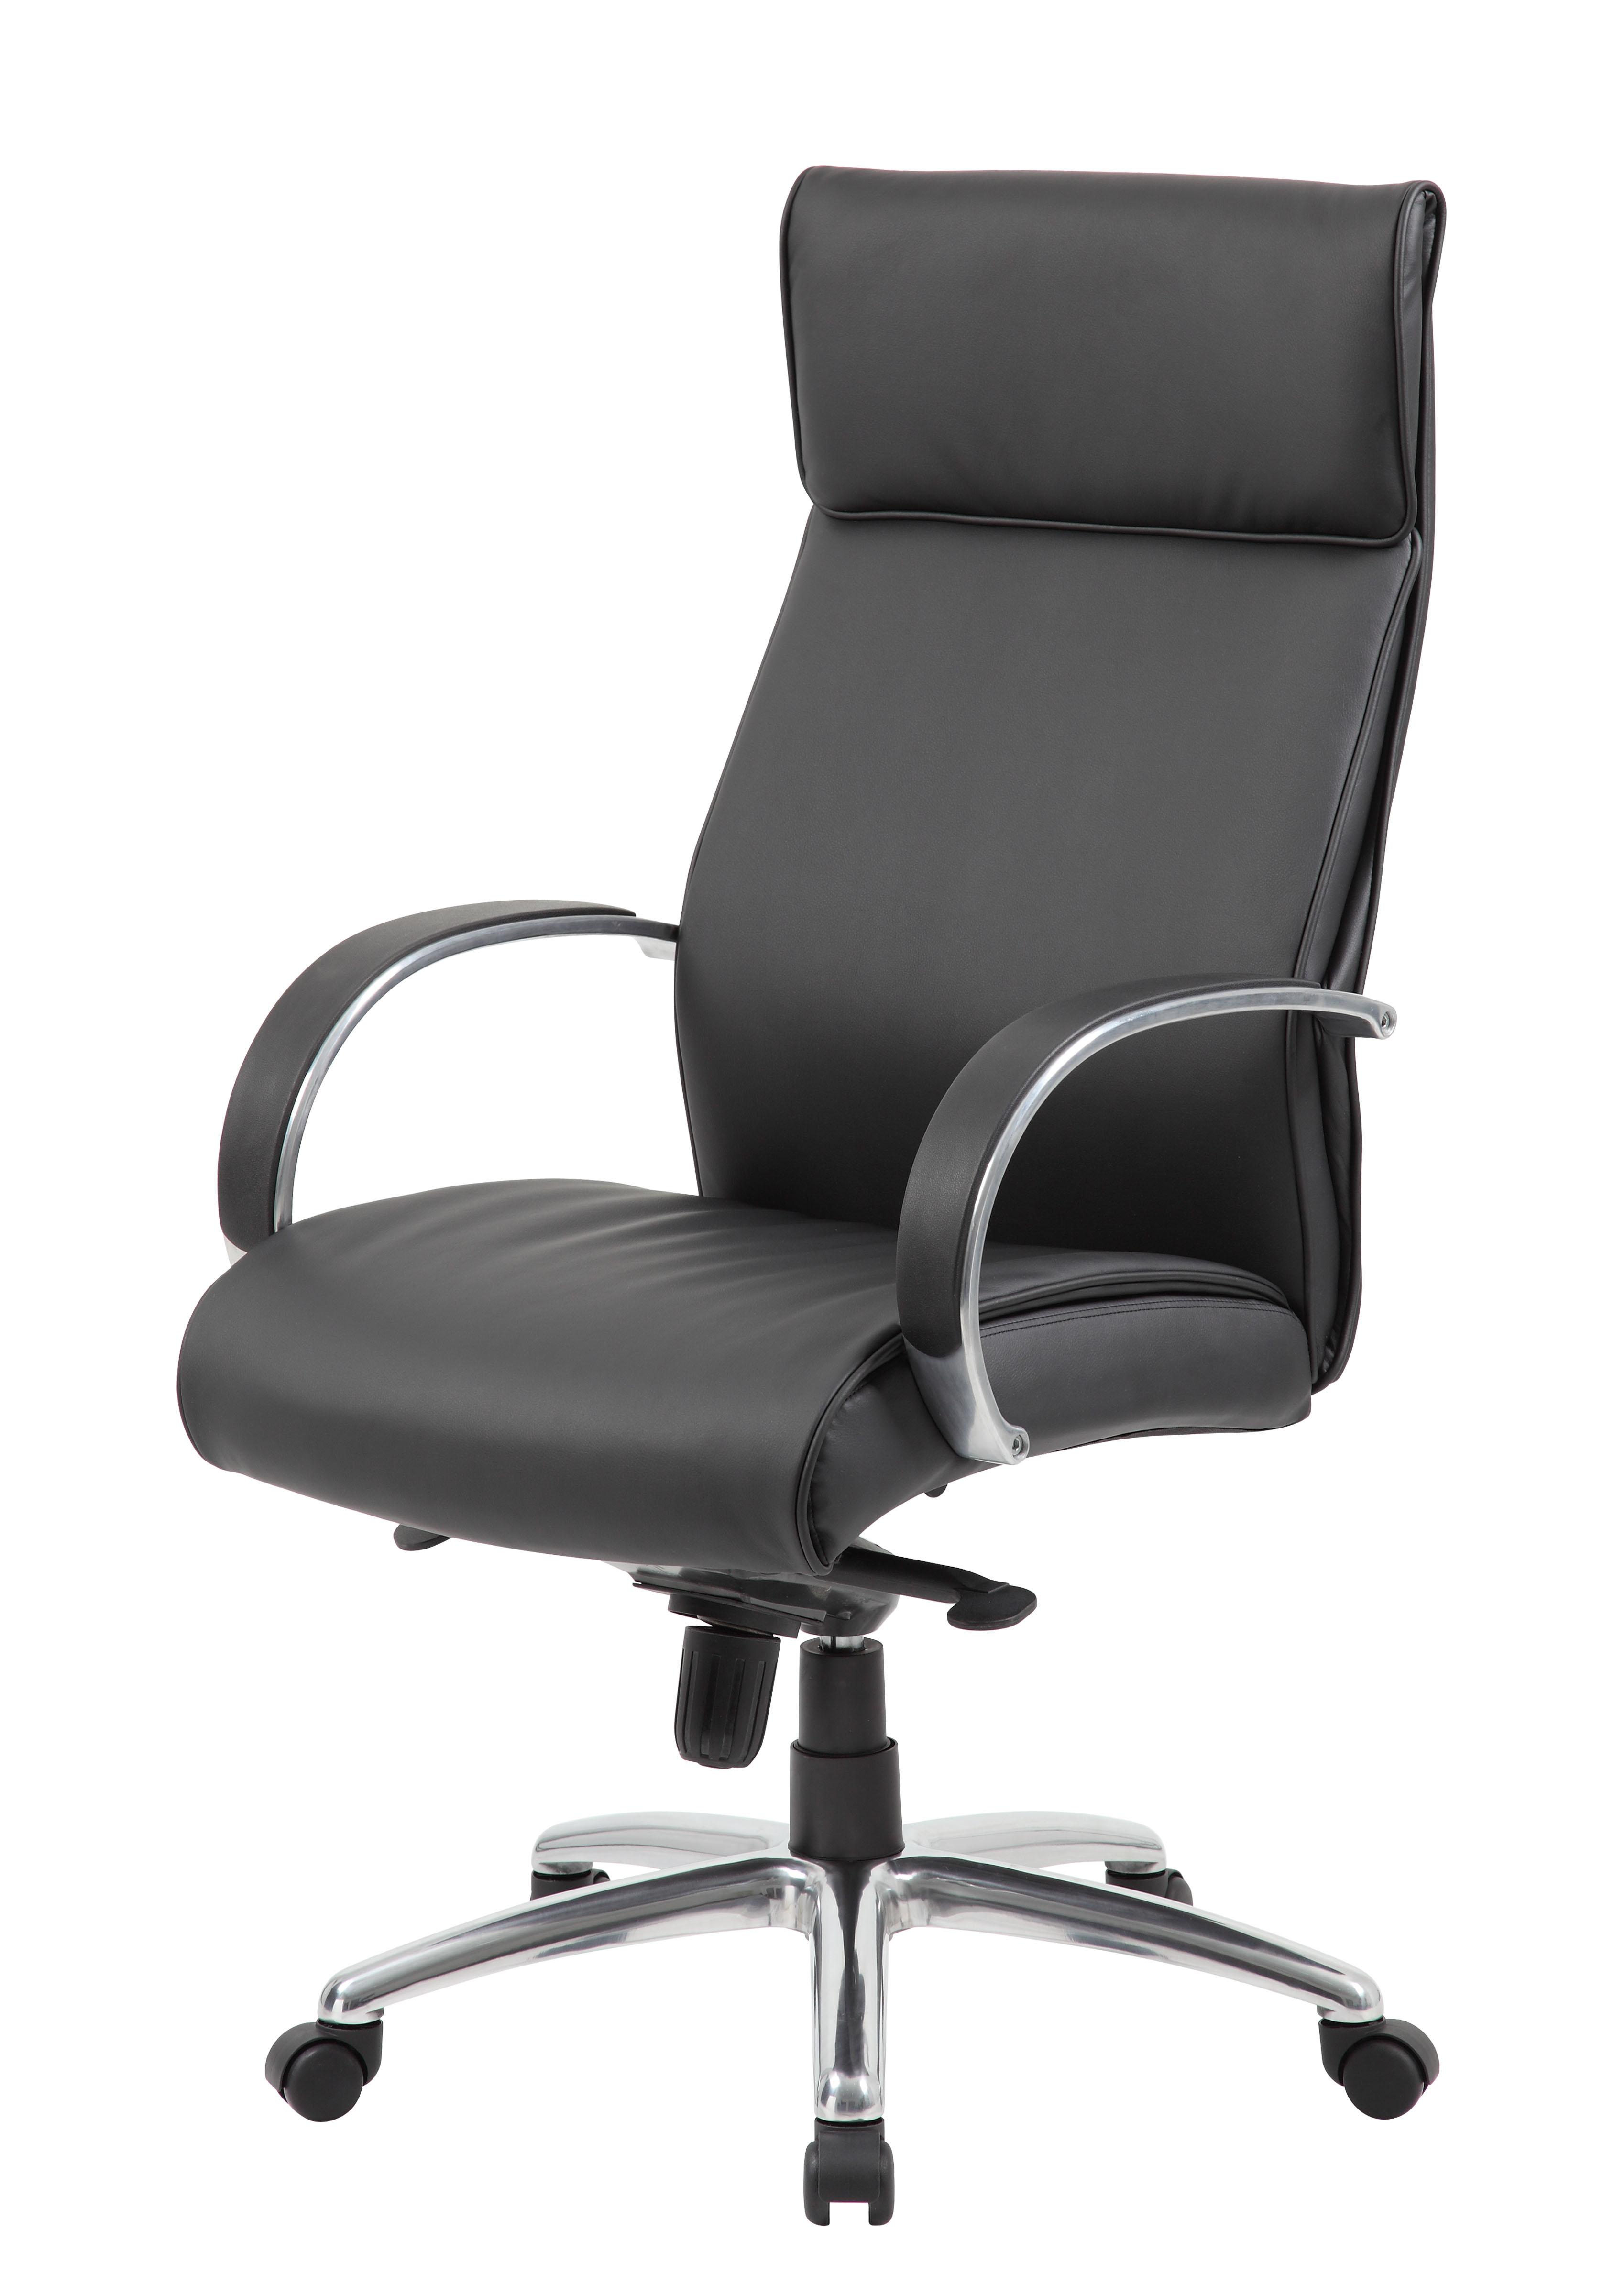 Charmant Boss High Back Executive Chair / Aluminum Finish / Black Upholstery / Knee  Tilt